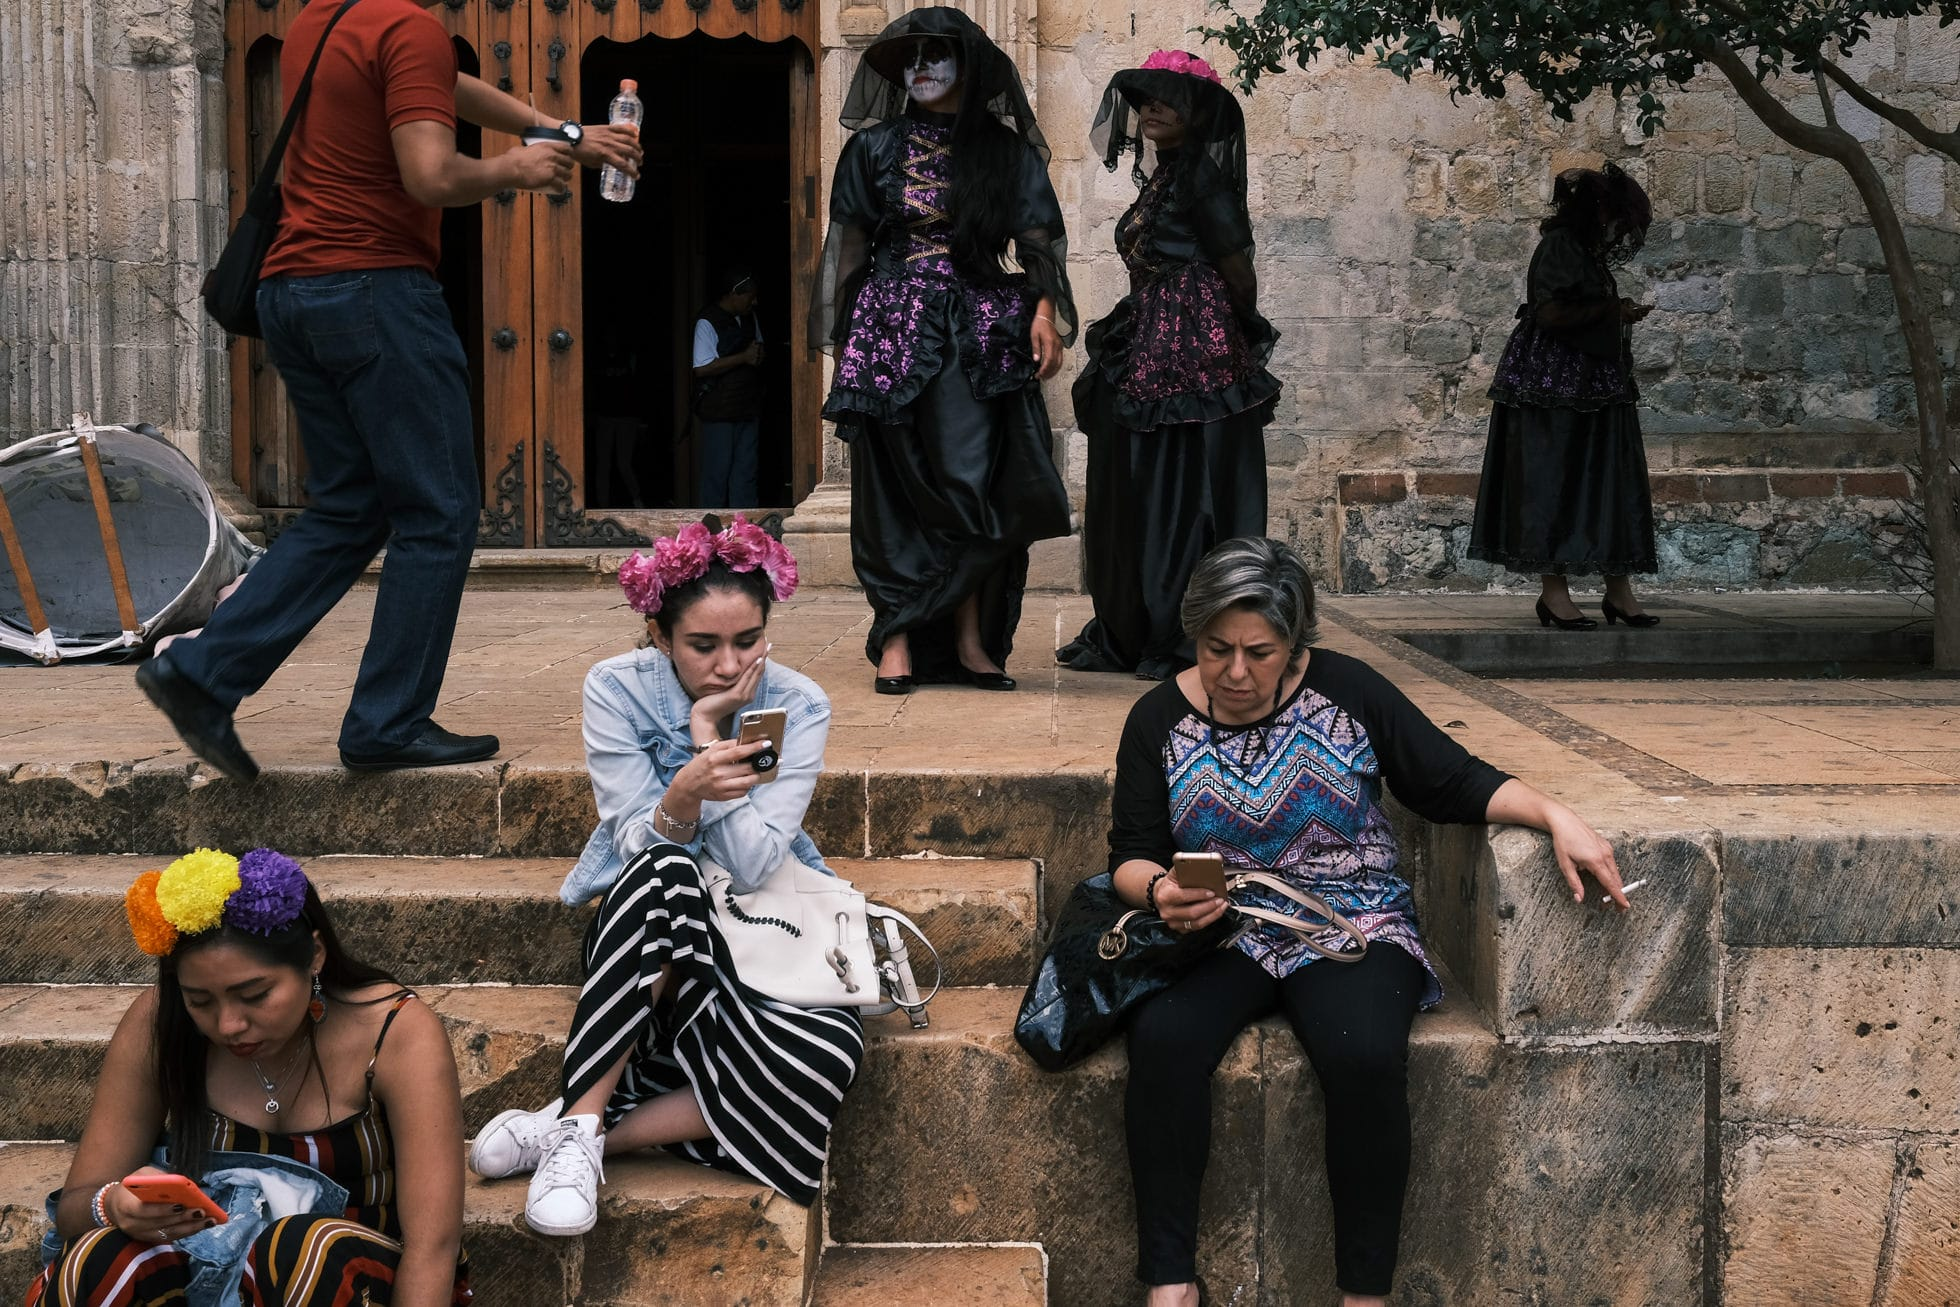 fujifilm-x-pro3-mexico-street-photography-75